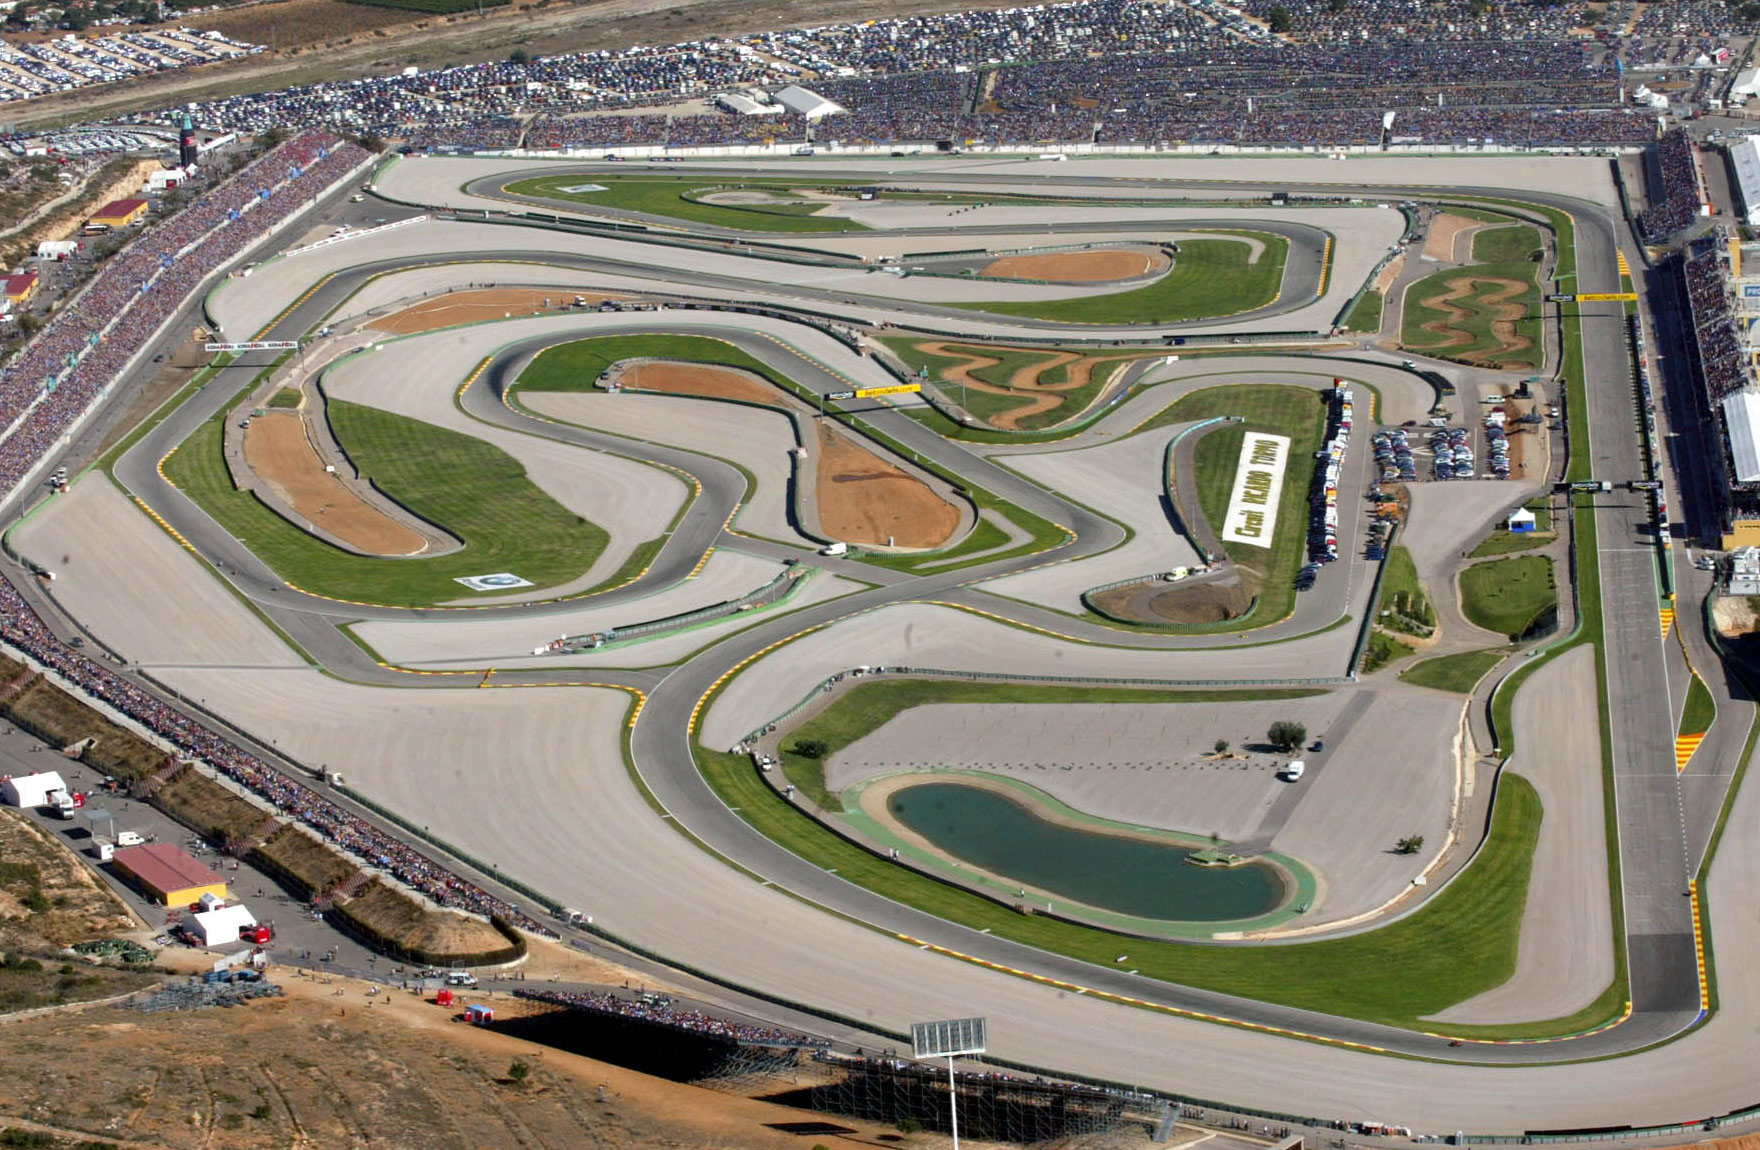 Circuito Urbano Valencia : Top mejores circuitos de carreras en españa cabroworld